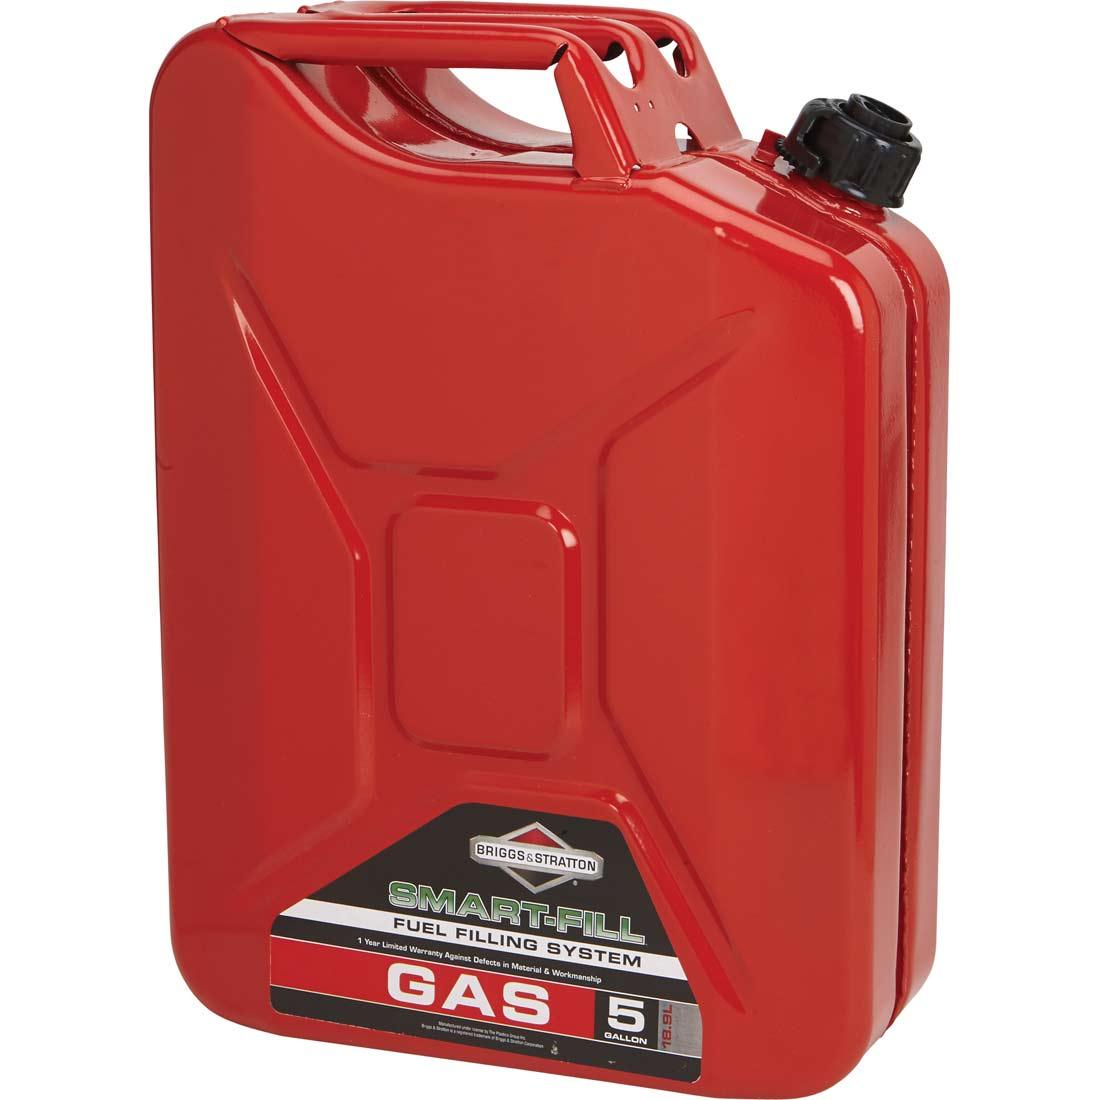 Briggs 5 Gallon Fuel Tank Can 20140605 20140605 Tanks